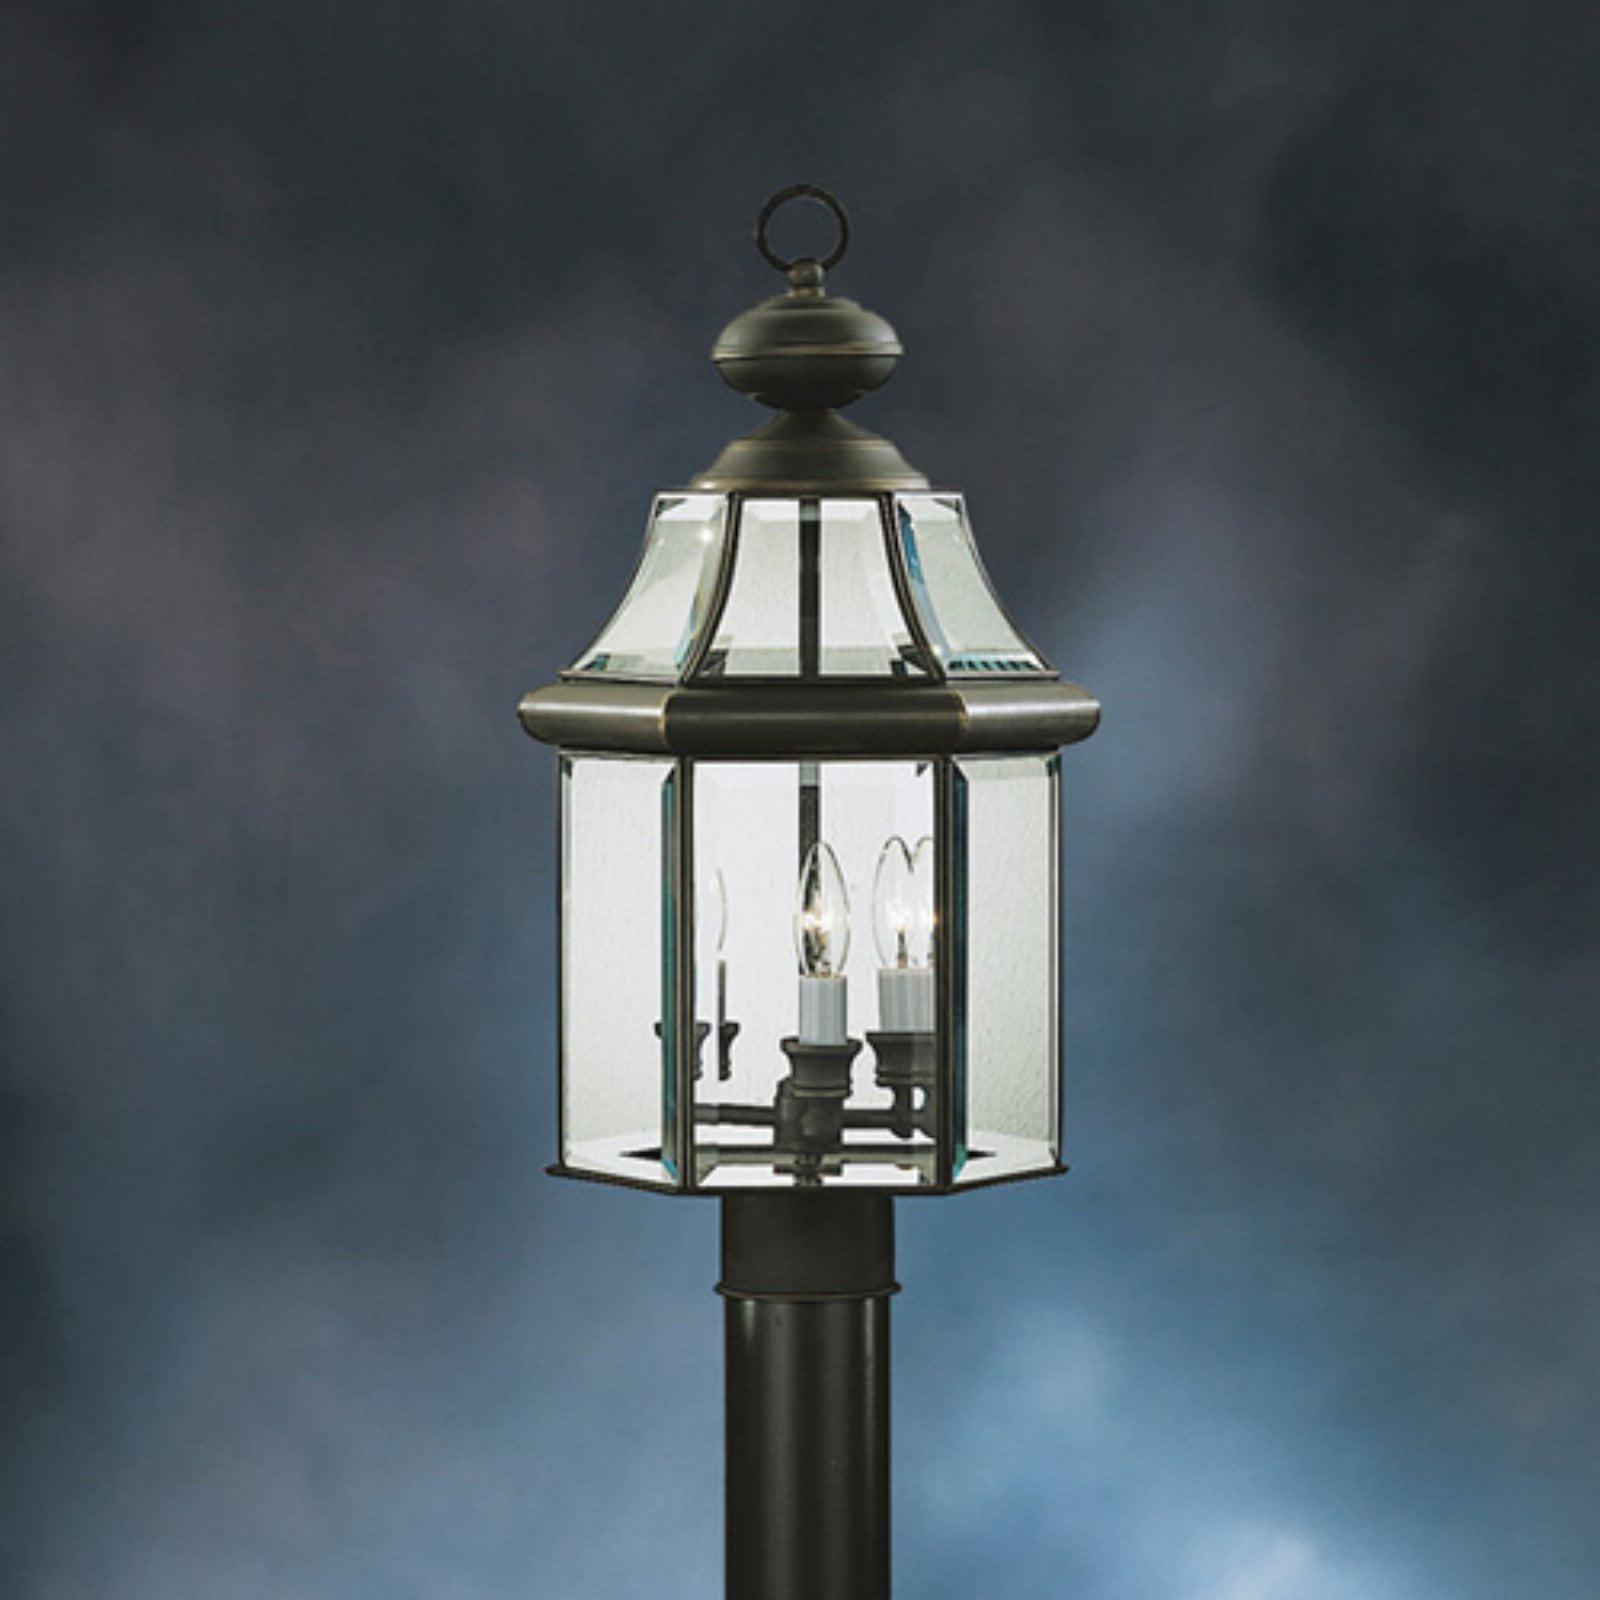 Kichler Embassy Row 9985 Outdoor Post Lantern - 10.5 in.